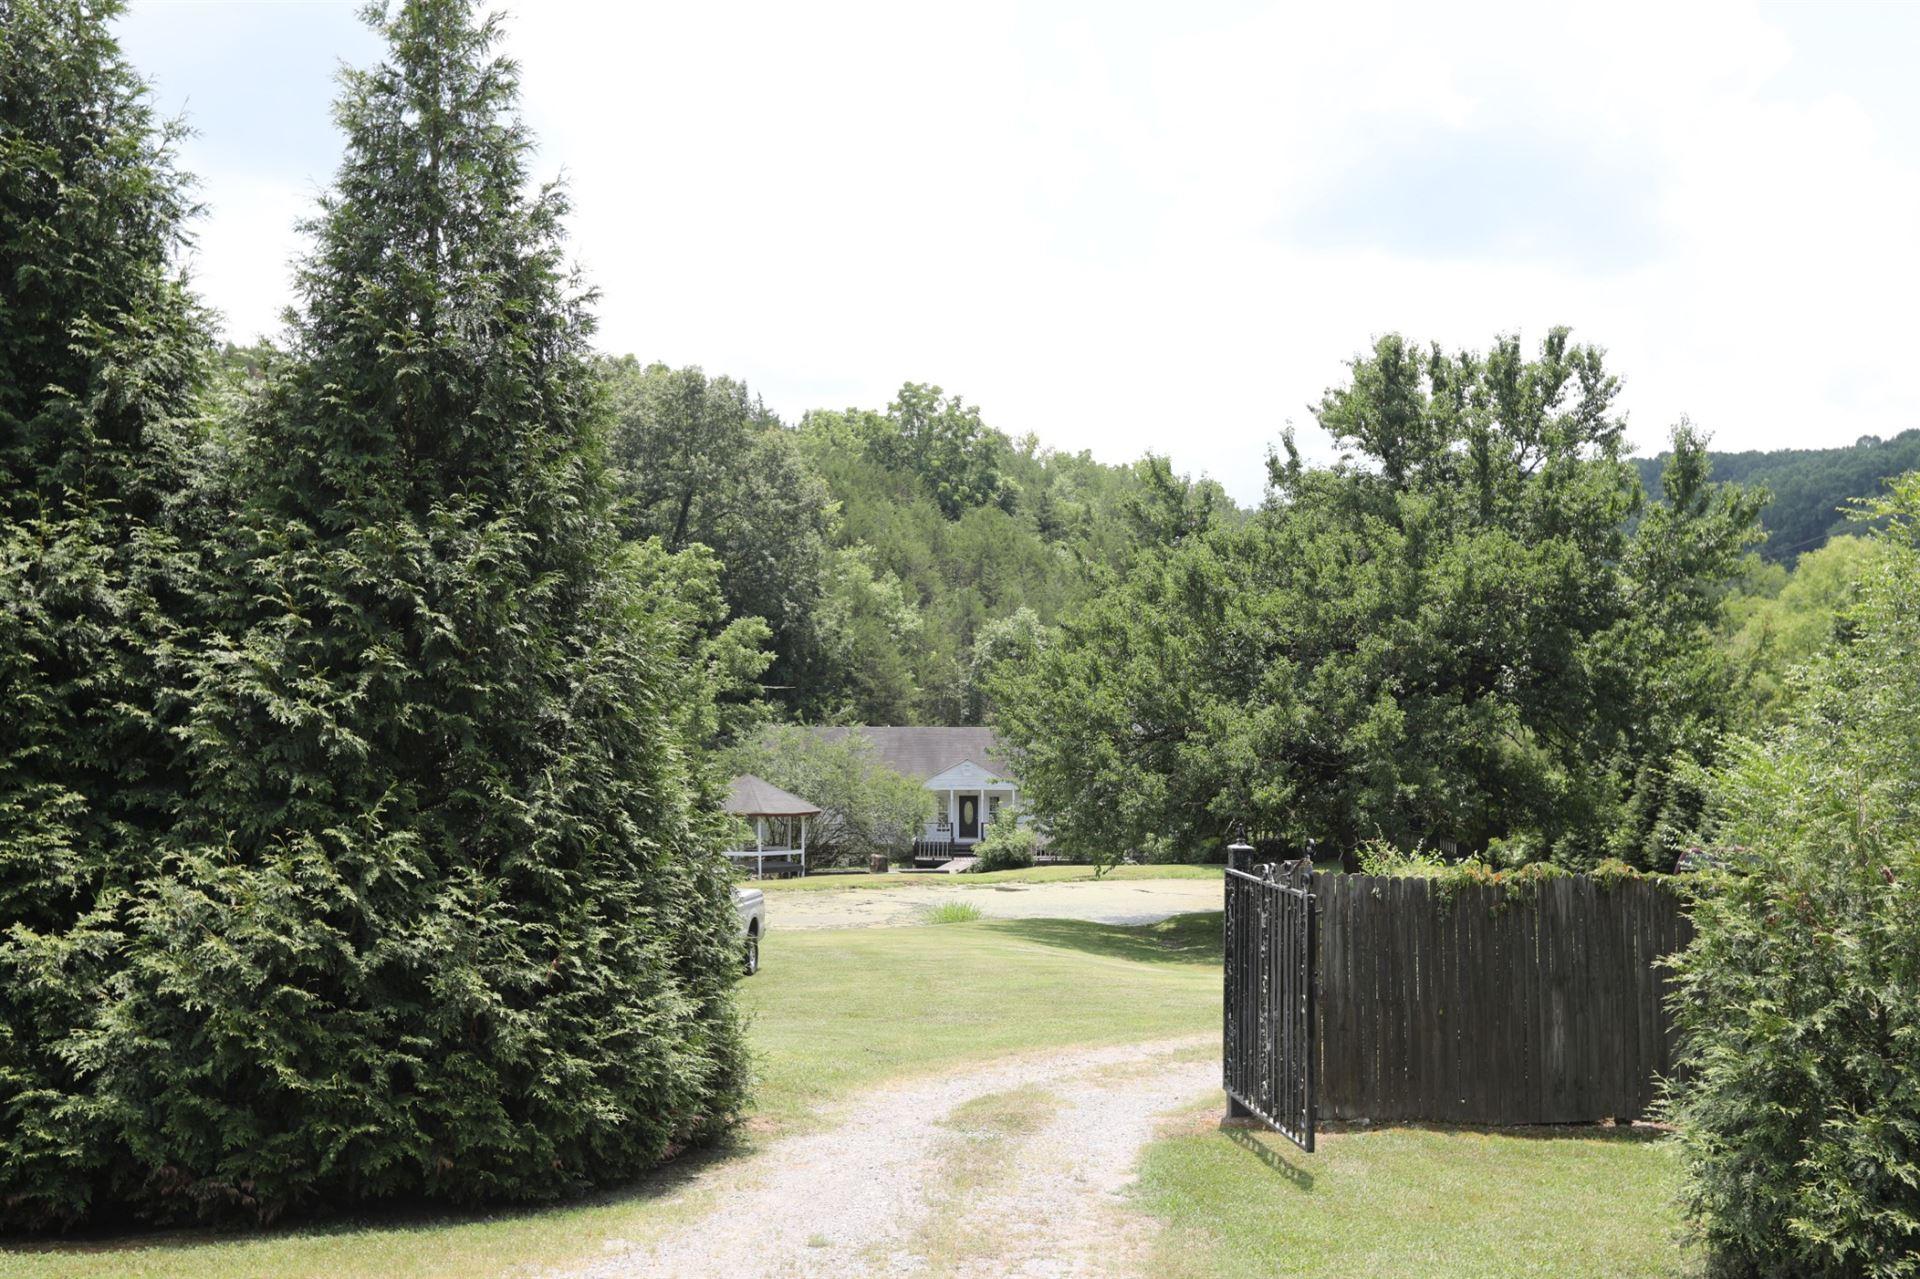 64 Wells Hill Rd, Fayetteville, TN 37334 - MLS#: 2176120